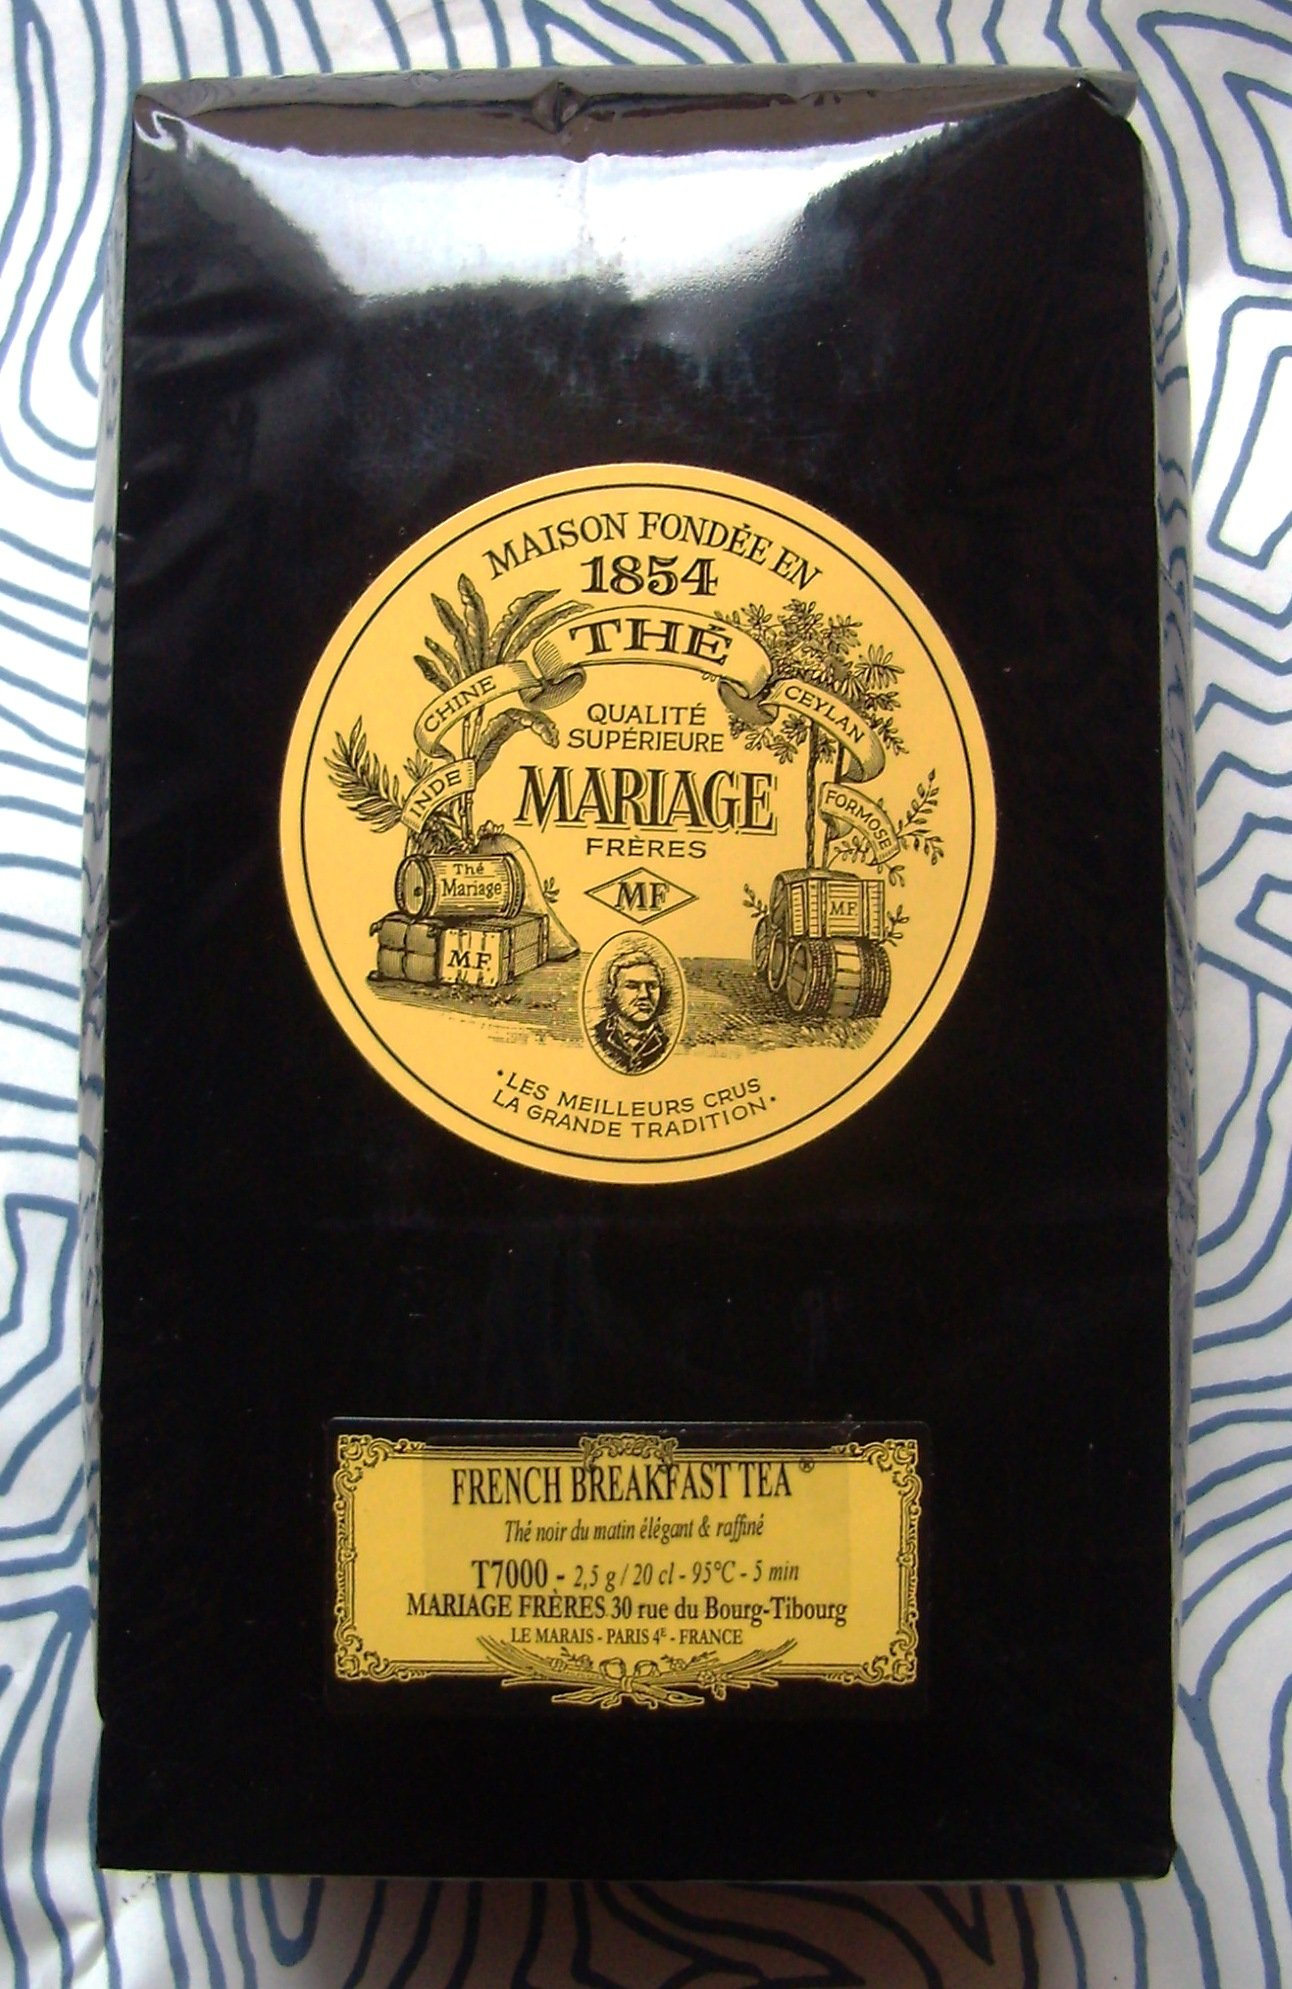 Mariage Freres - FRENCH BREAKFAST TEA (T7000) - 17.63oz / 500gr Loose Leaf BULK BAG